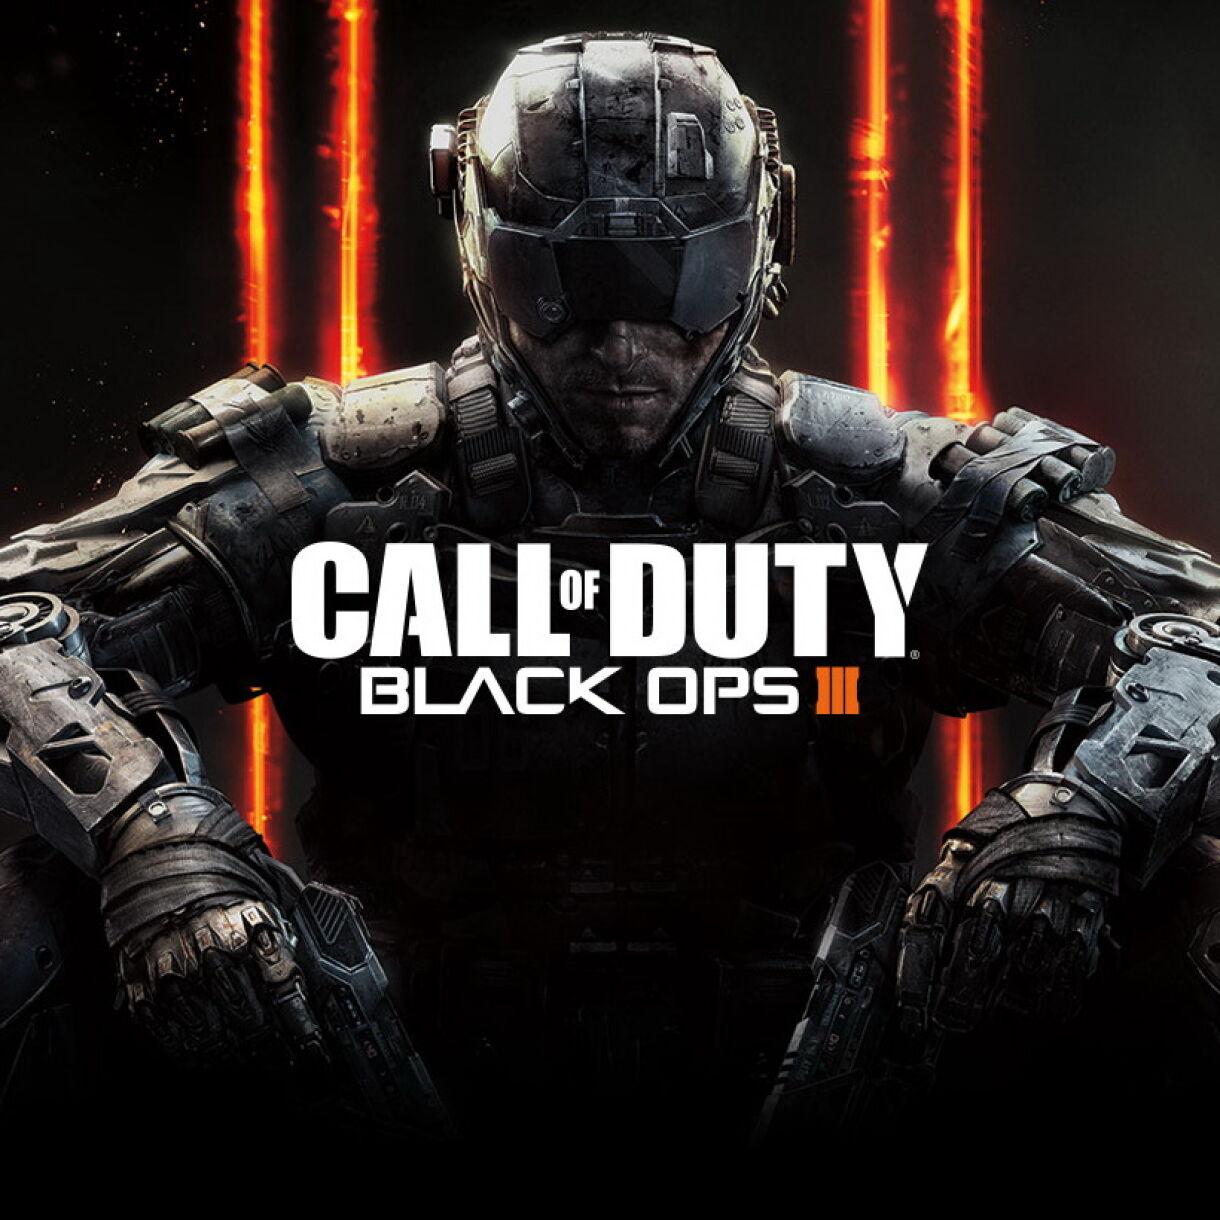 Call of Duty: Black Ops 3 earned $500 million in 72 hours